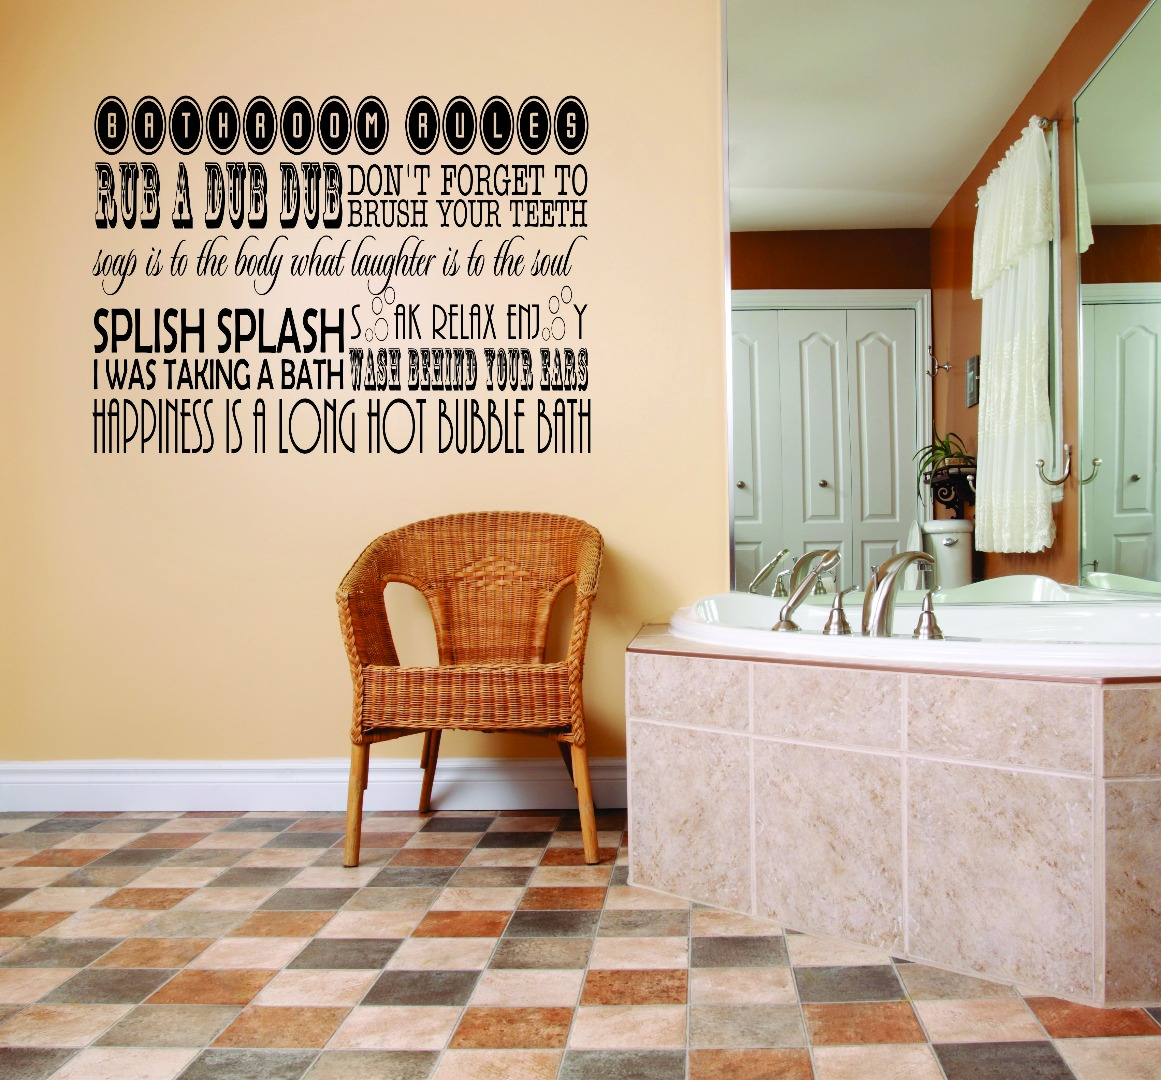 PERSONALIZED SPLISH SPLASH BATH TUB BATHROOM DOUBLE LIGHT SWITCH PLATE COVER